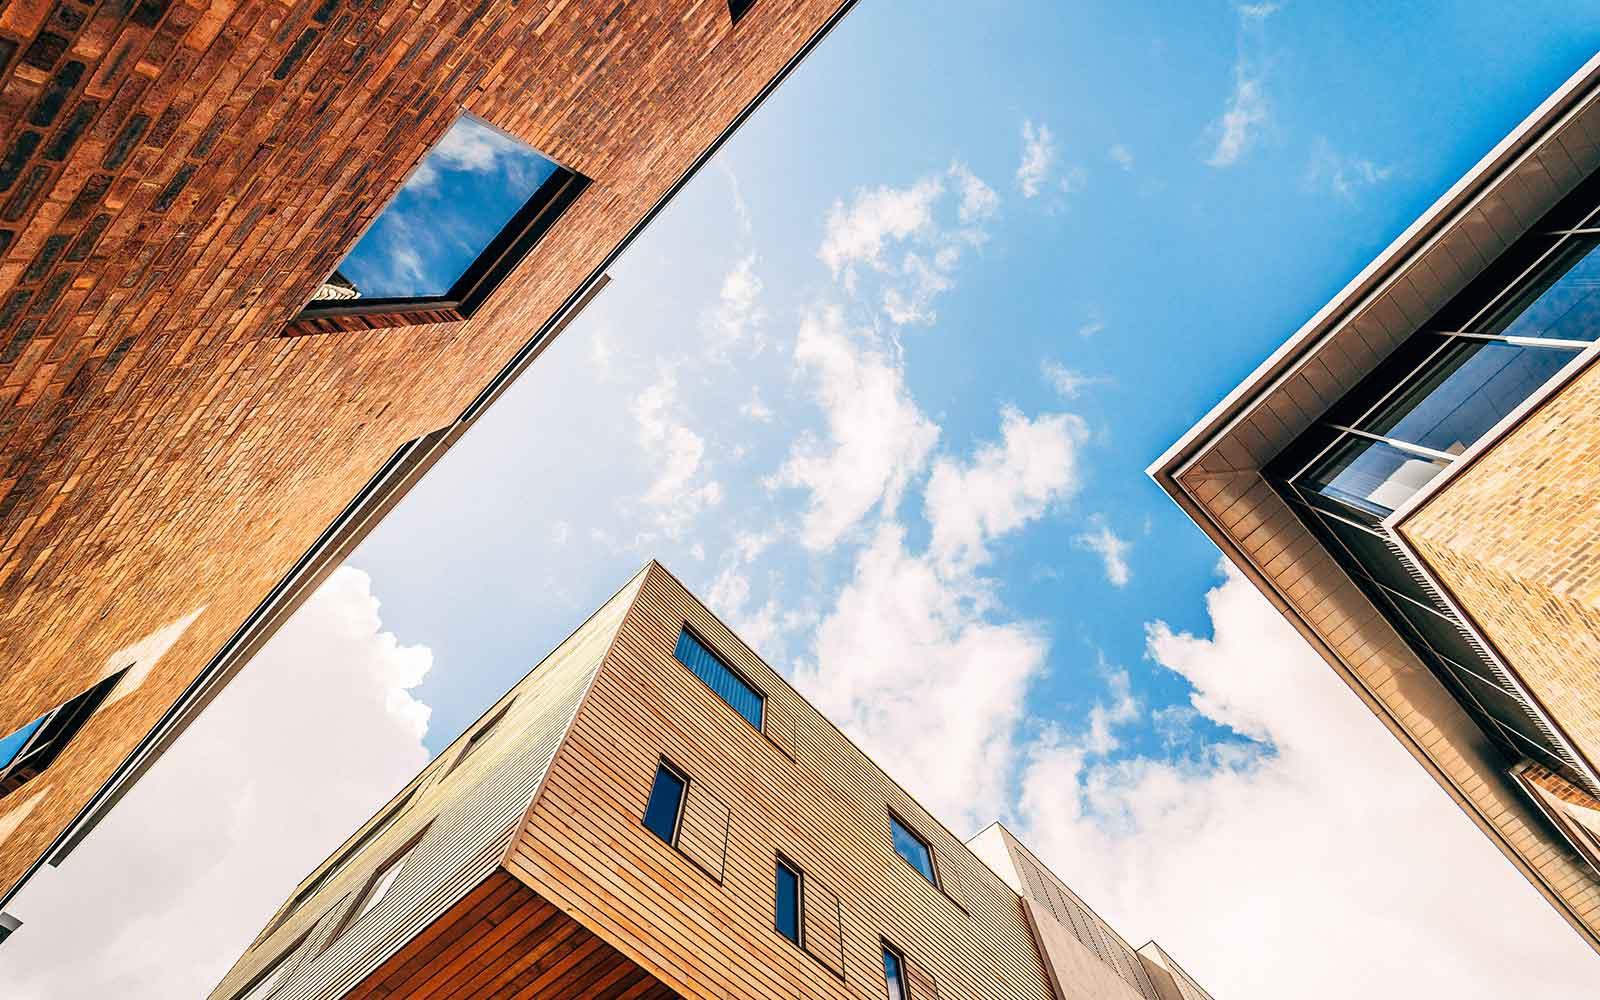 Campus buildings with blue skies